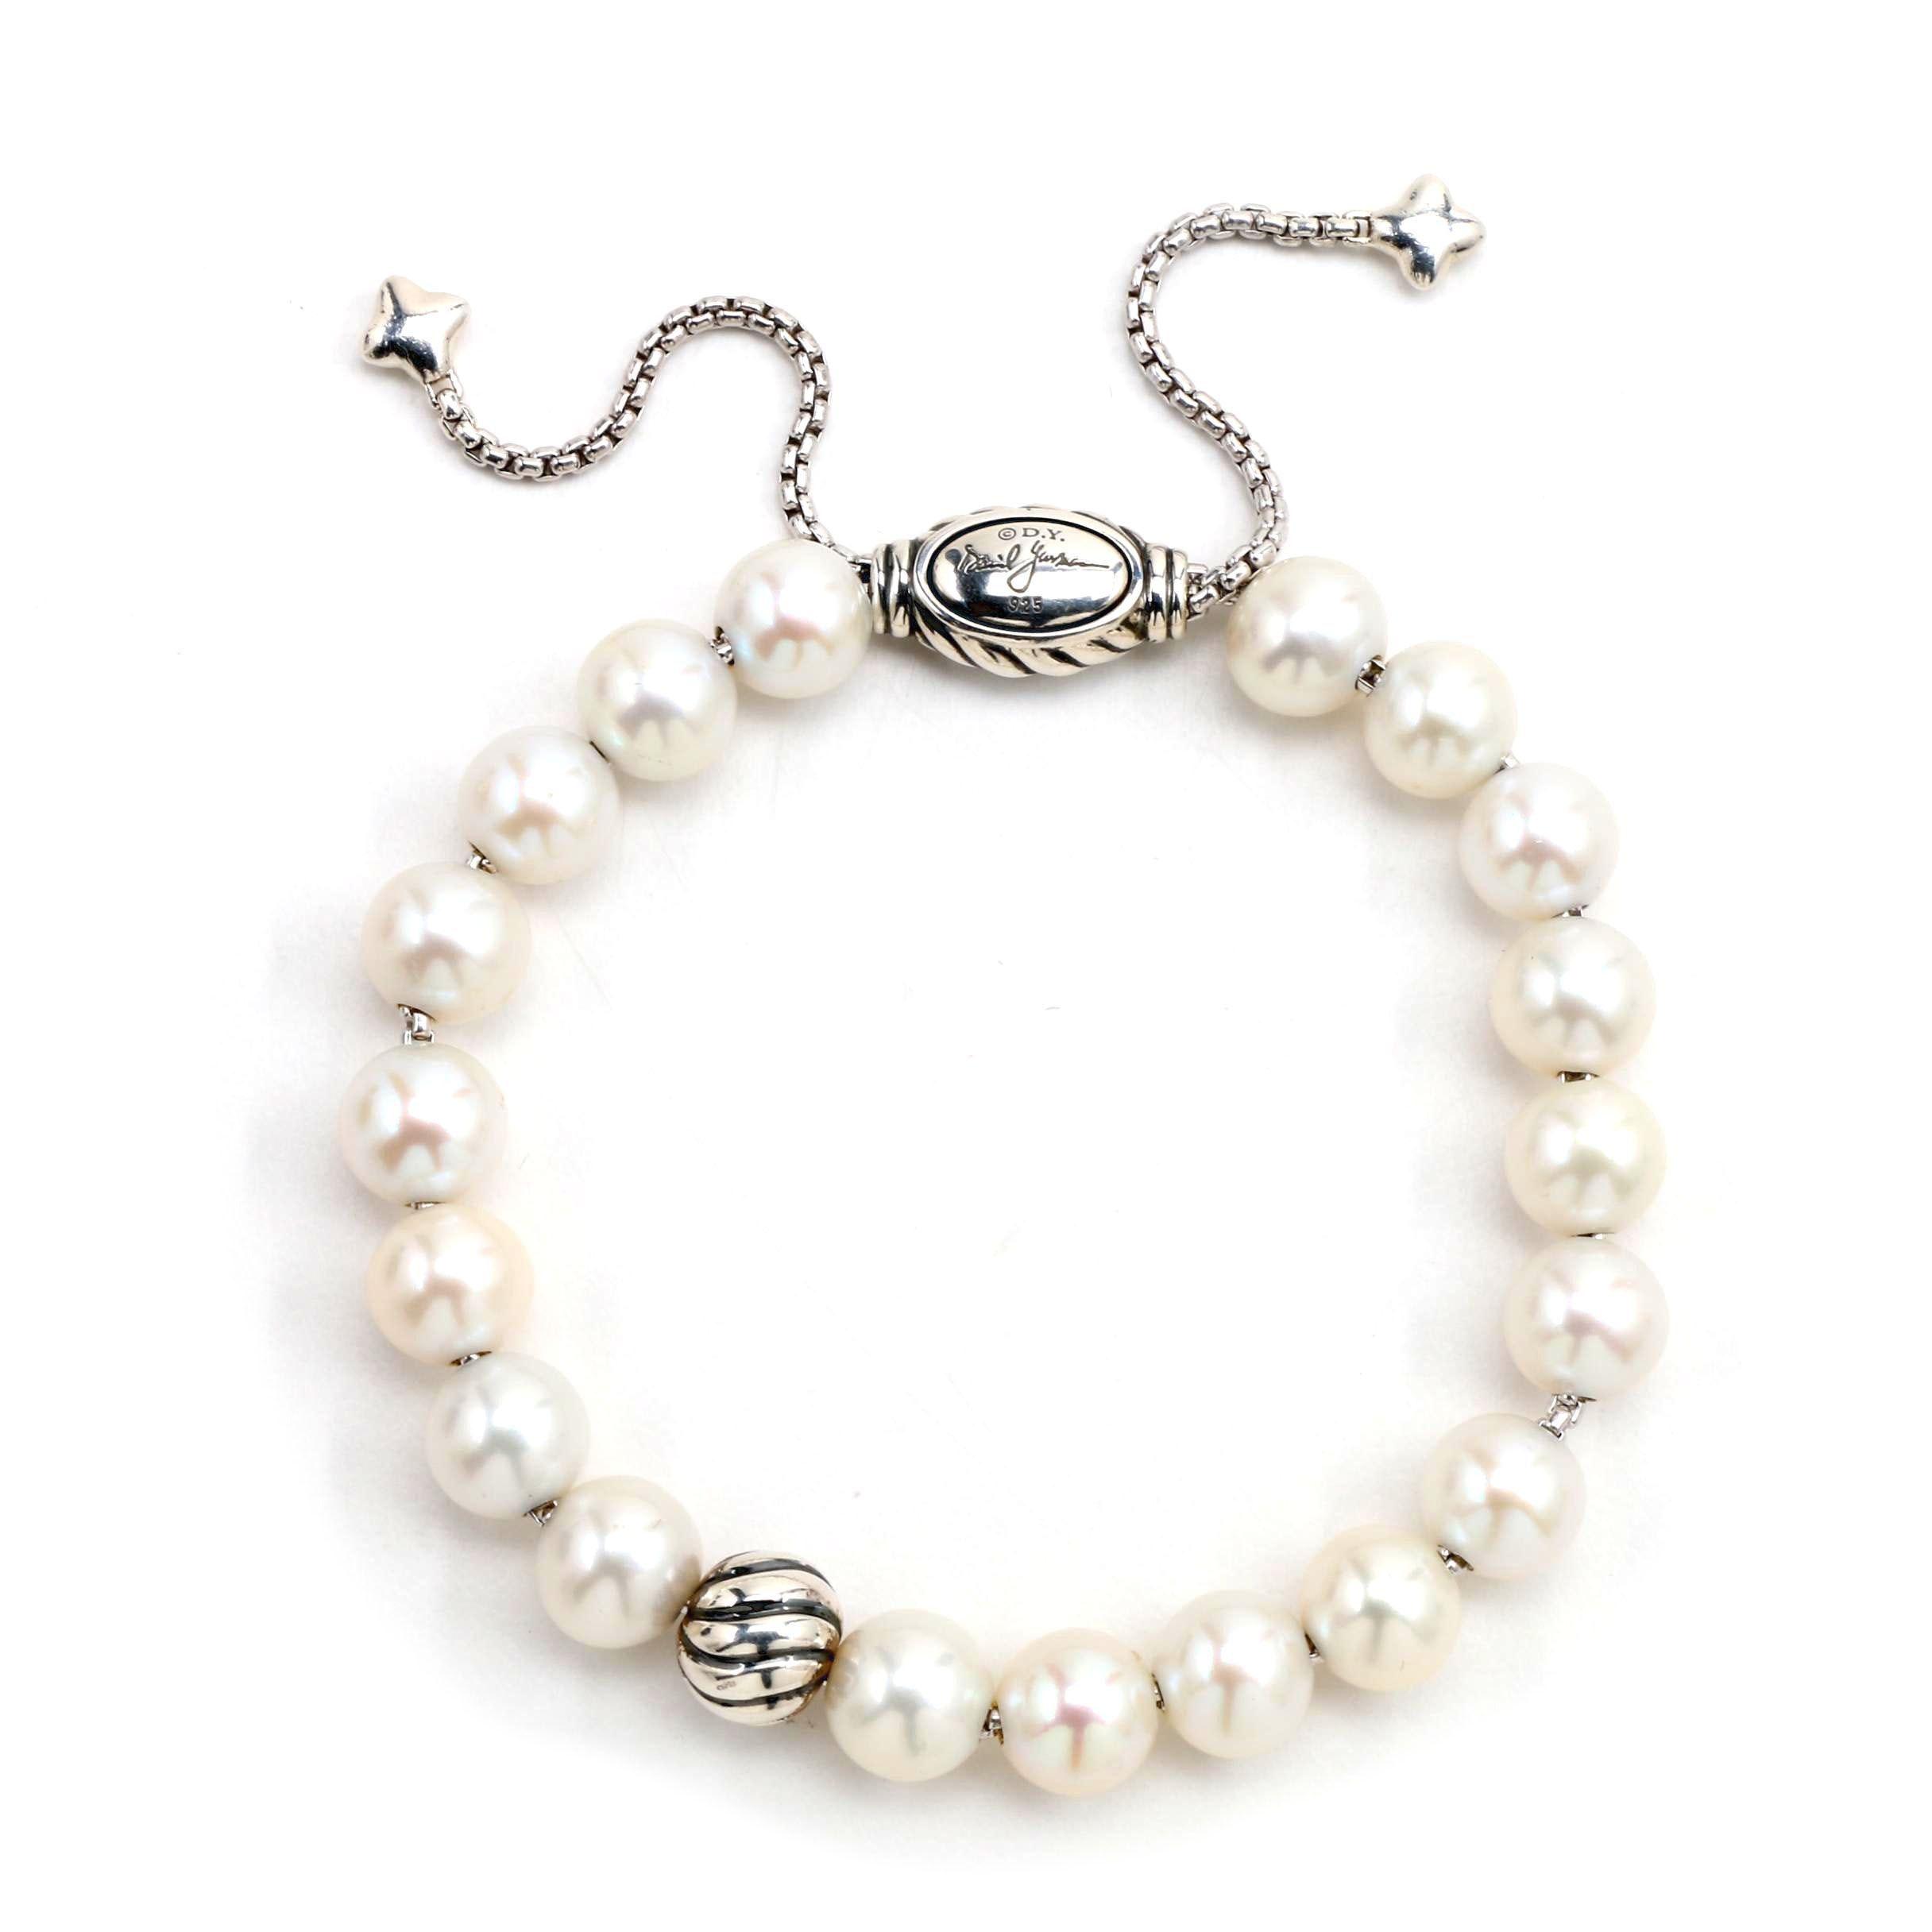 David Yurman Cultured Pearl Bracelet on Adjustable Sterling Silver Chain